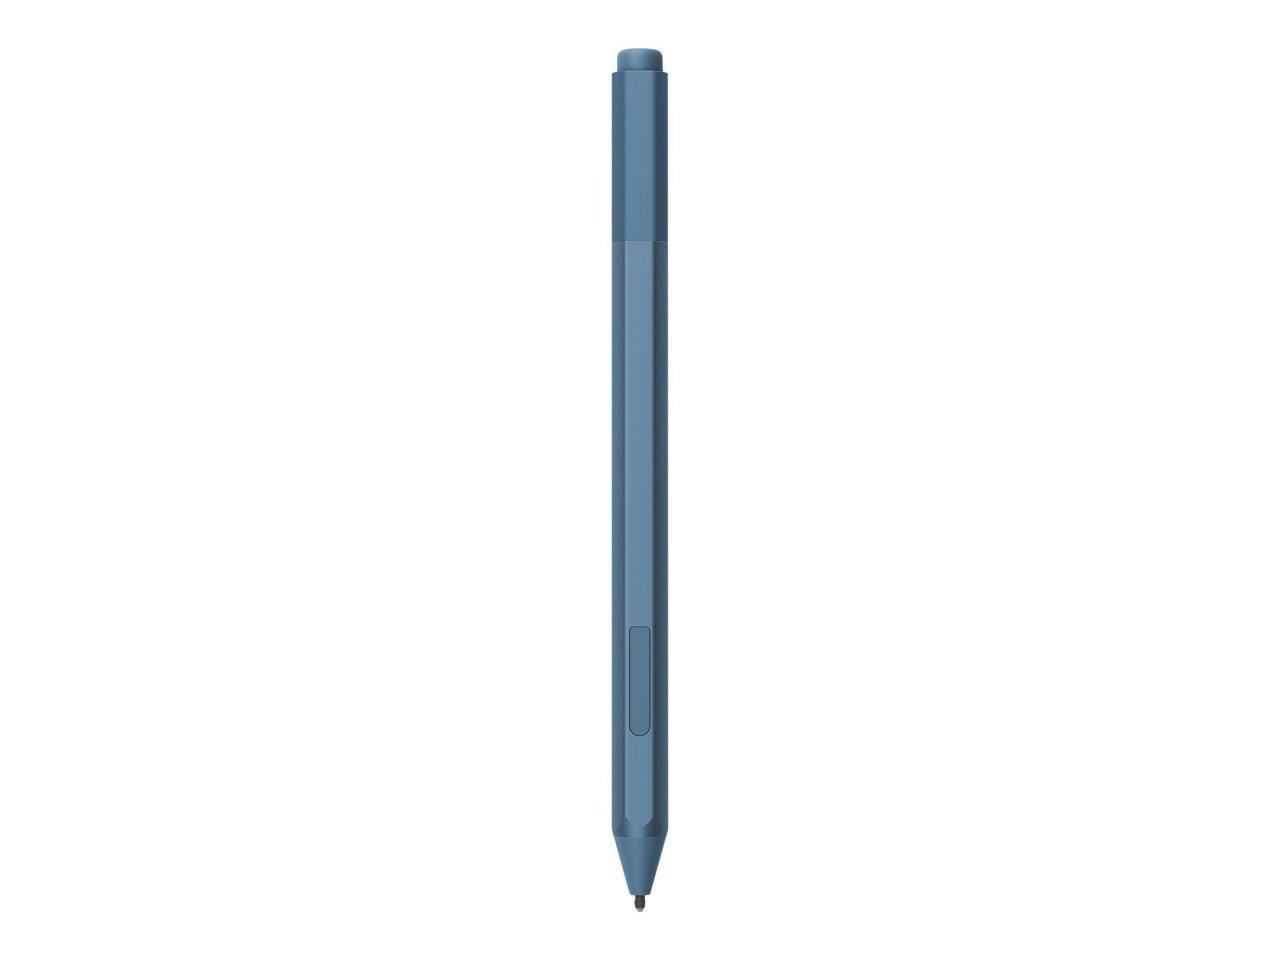 Microsoft Surface Pen - Stift Eisblau EYV-00050